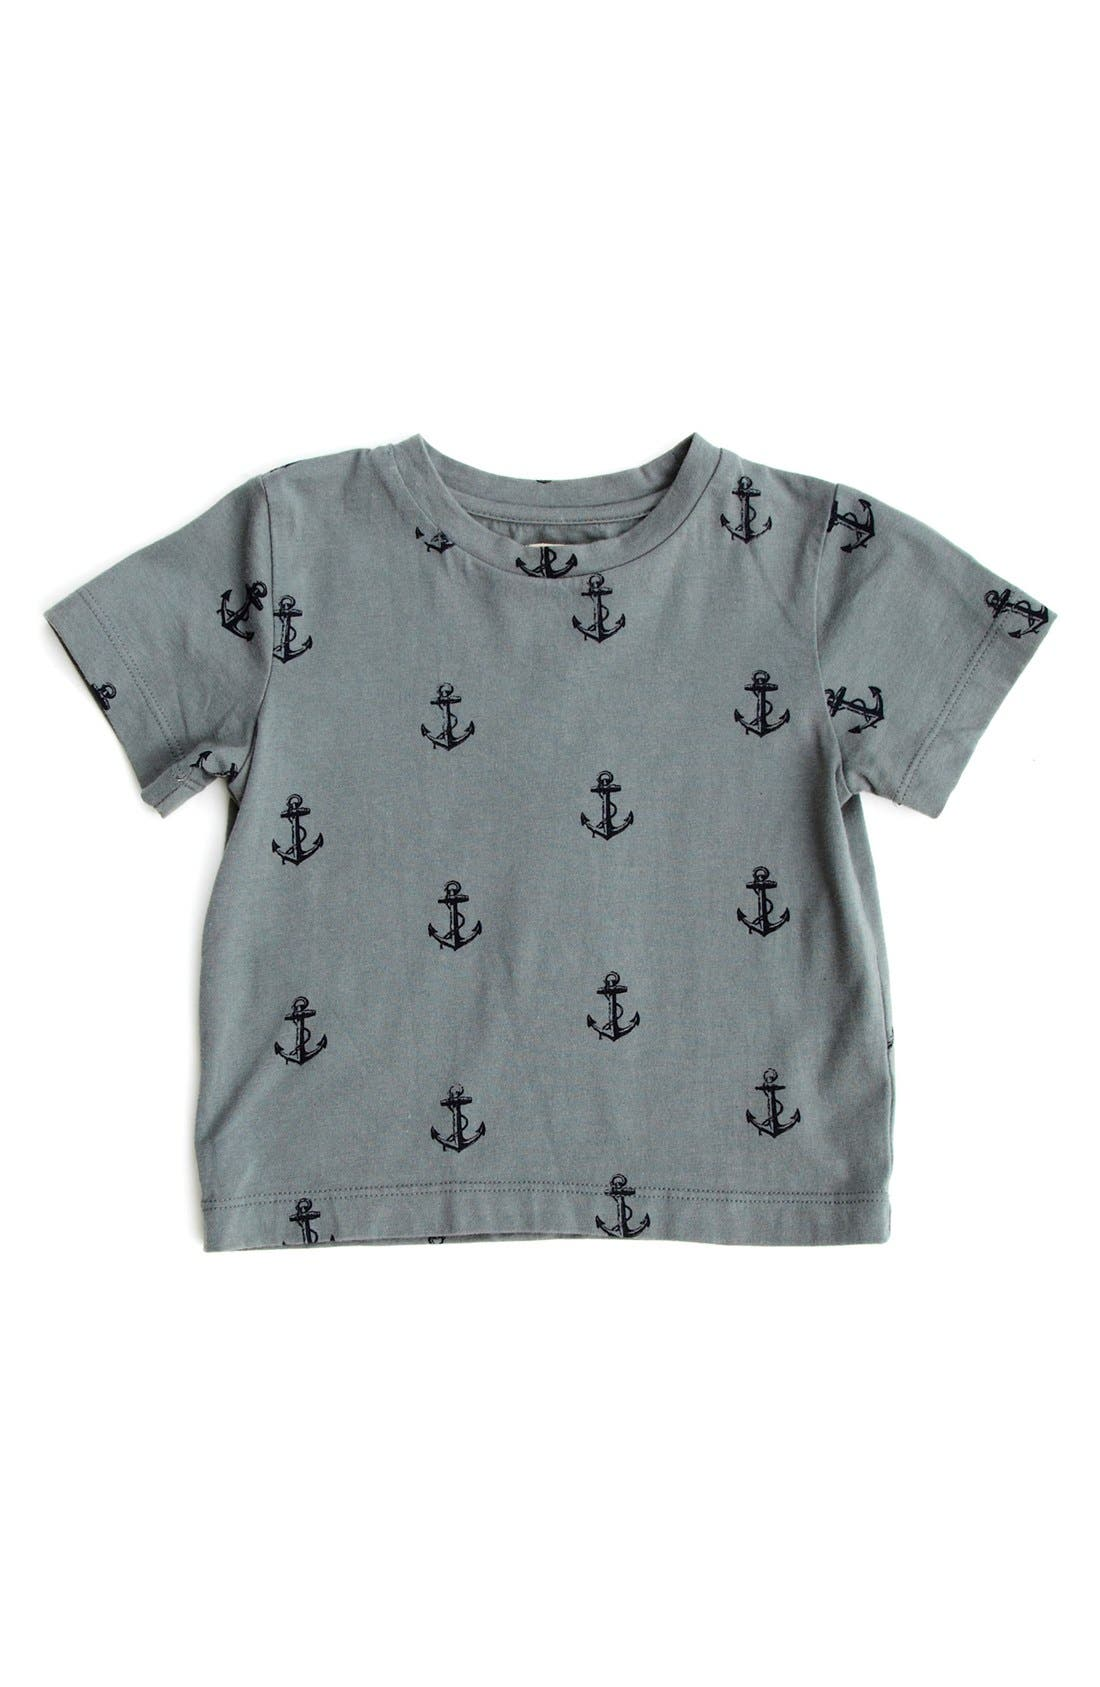 Alternate Image 1 Selected - Peek 'Allover Anchor' T-Shirt (Baby Boys)